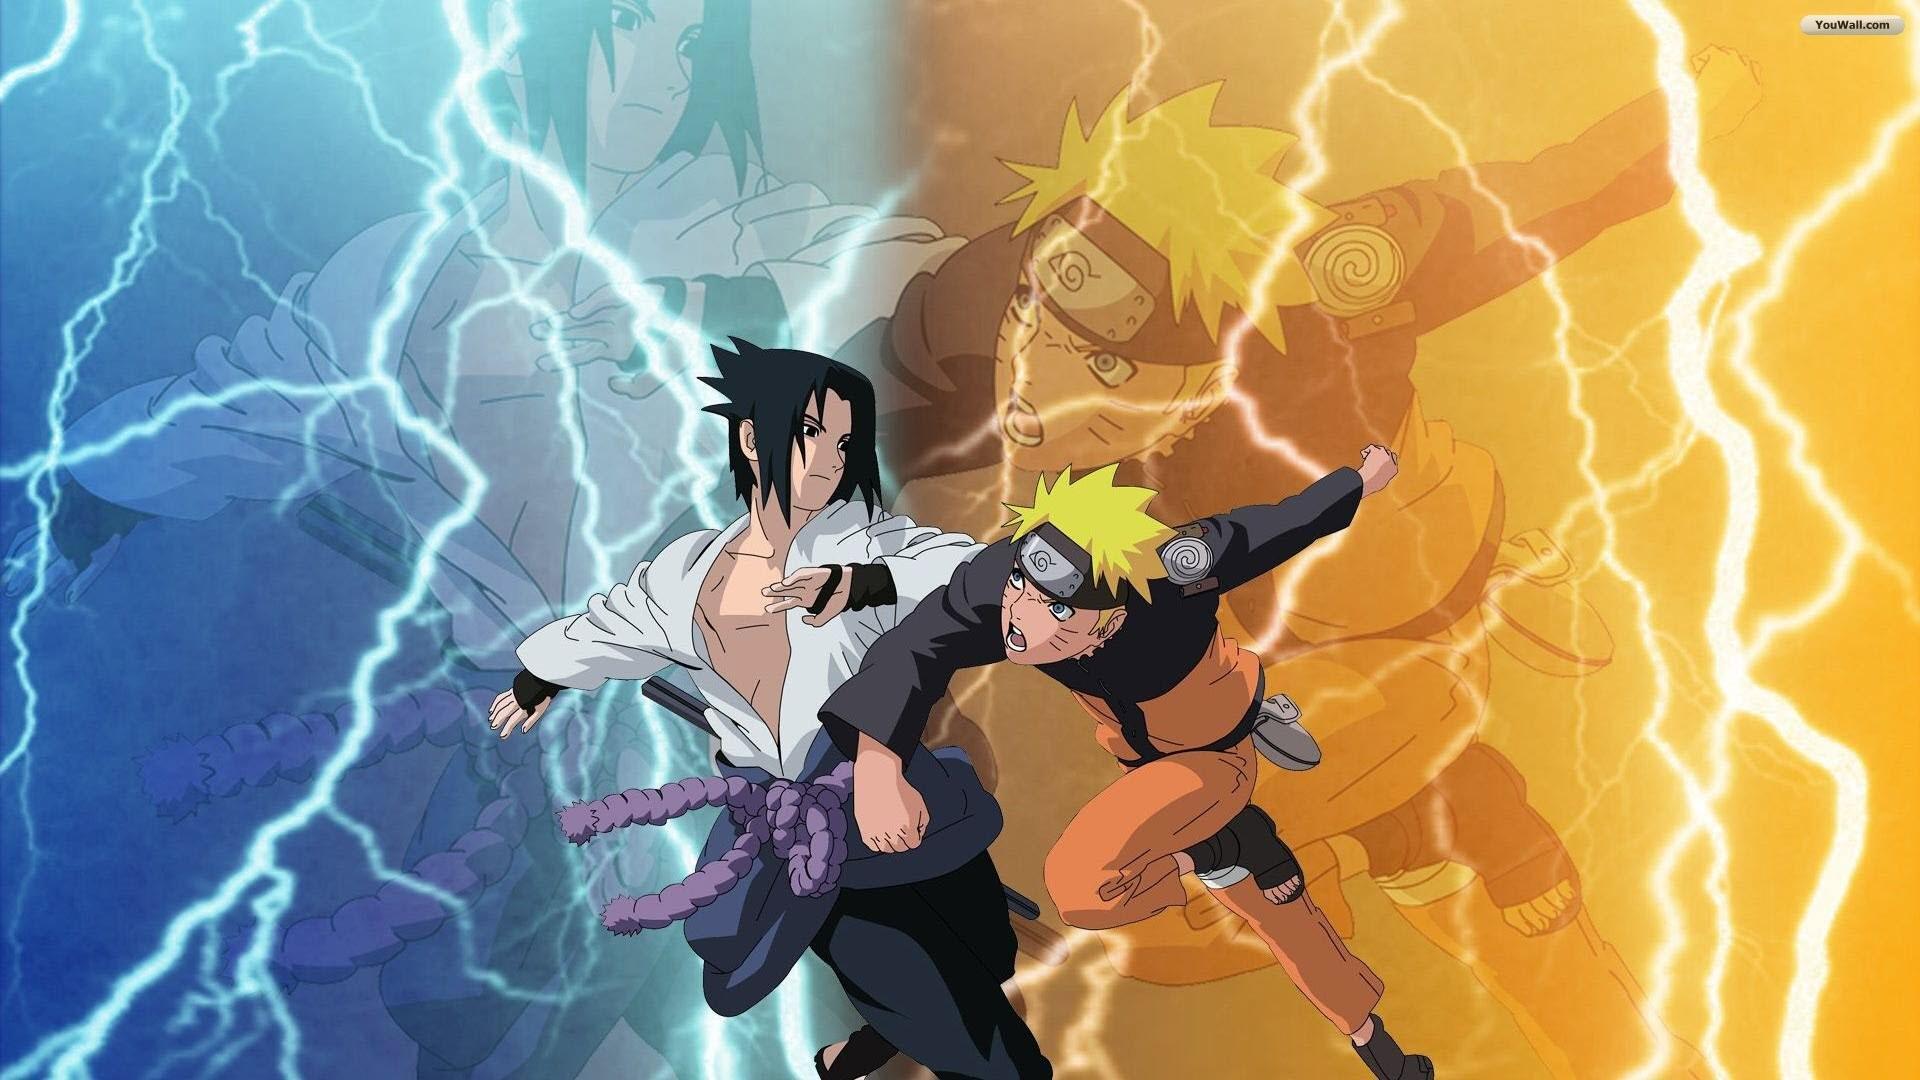 Sasuke and Naruto Wallpaper ·① WallpaperTag